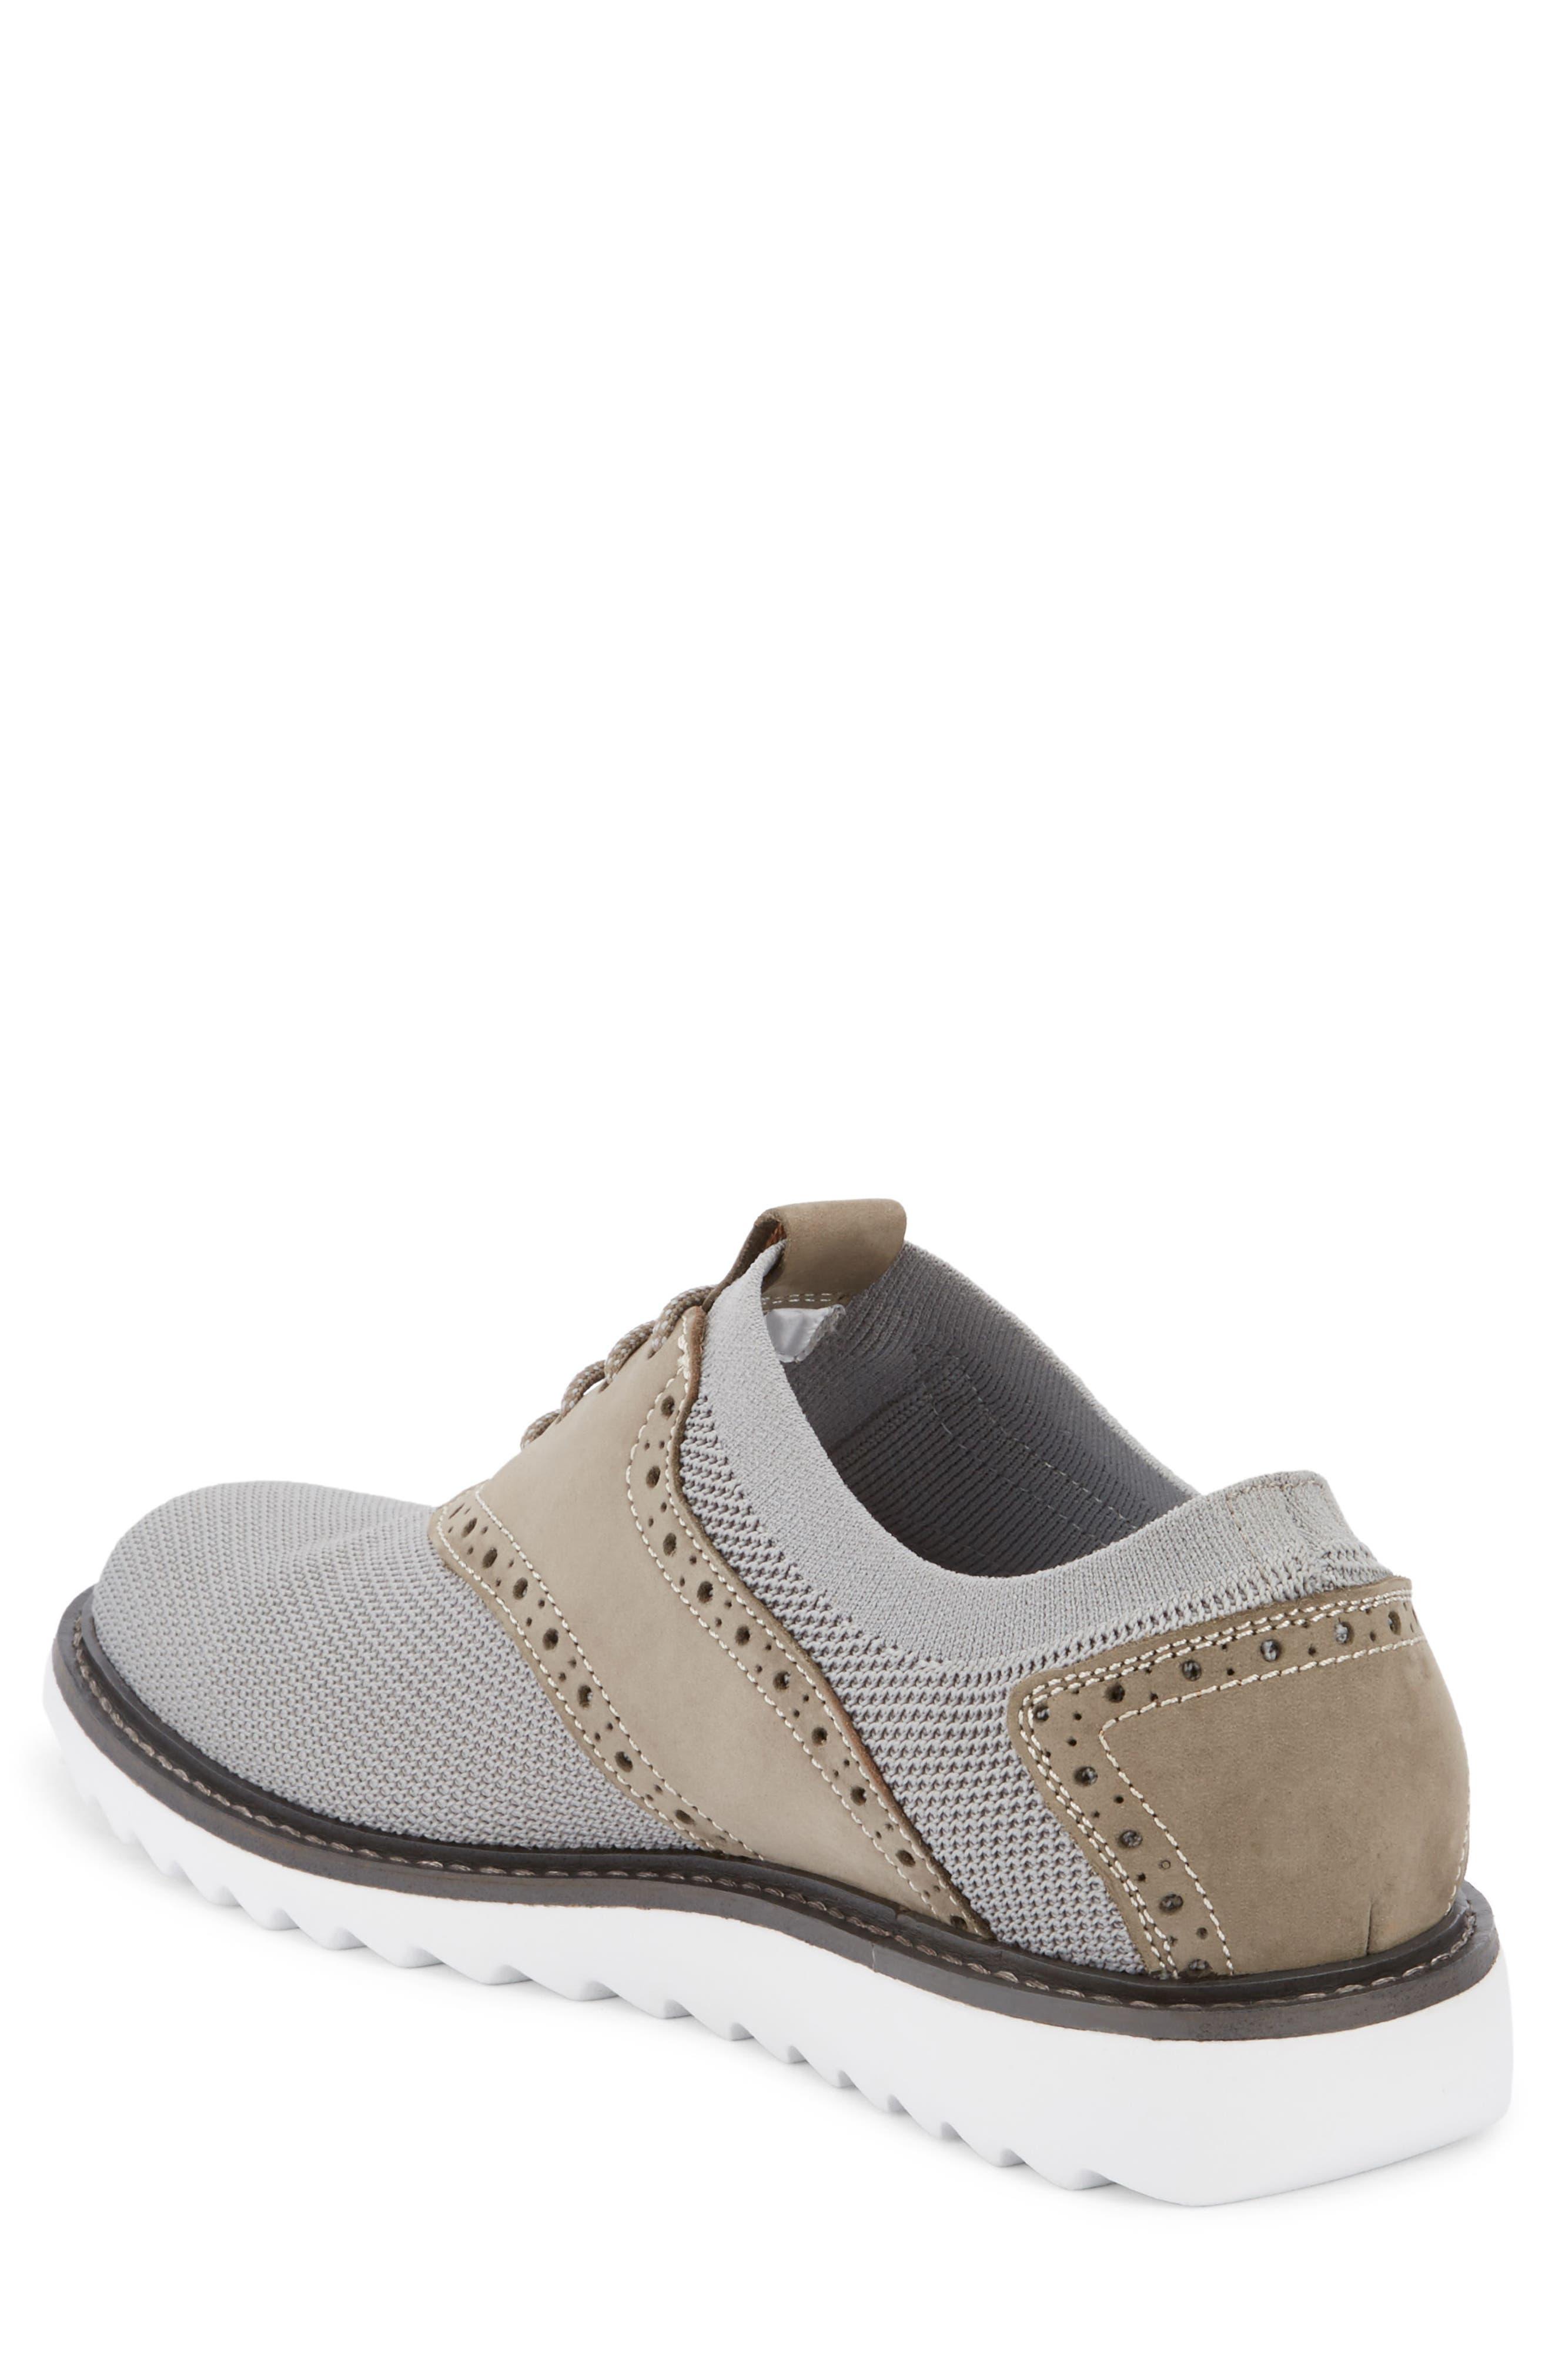 Buck 2.0 Saddle Shoe,                             Alternate thumbnail 2, color,                             Light Grey Knit/ Nubuck